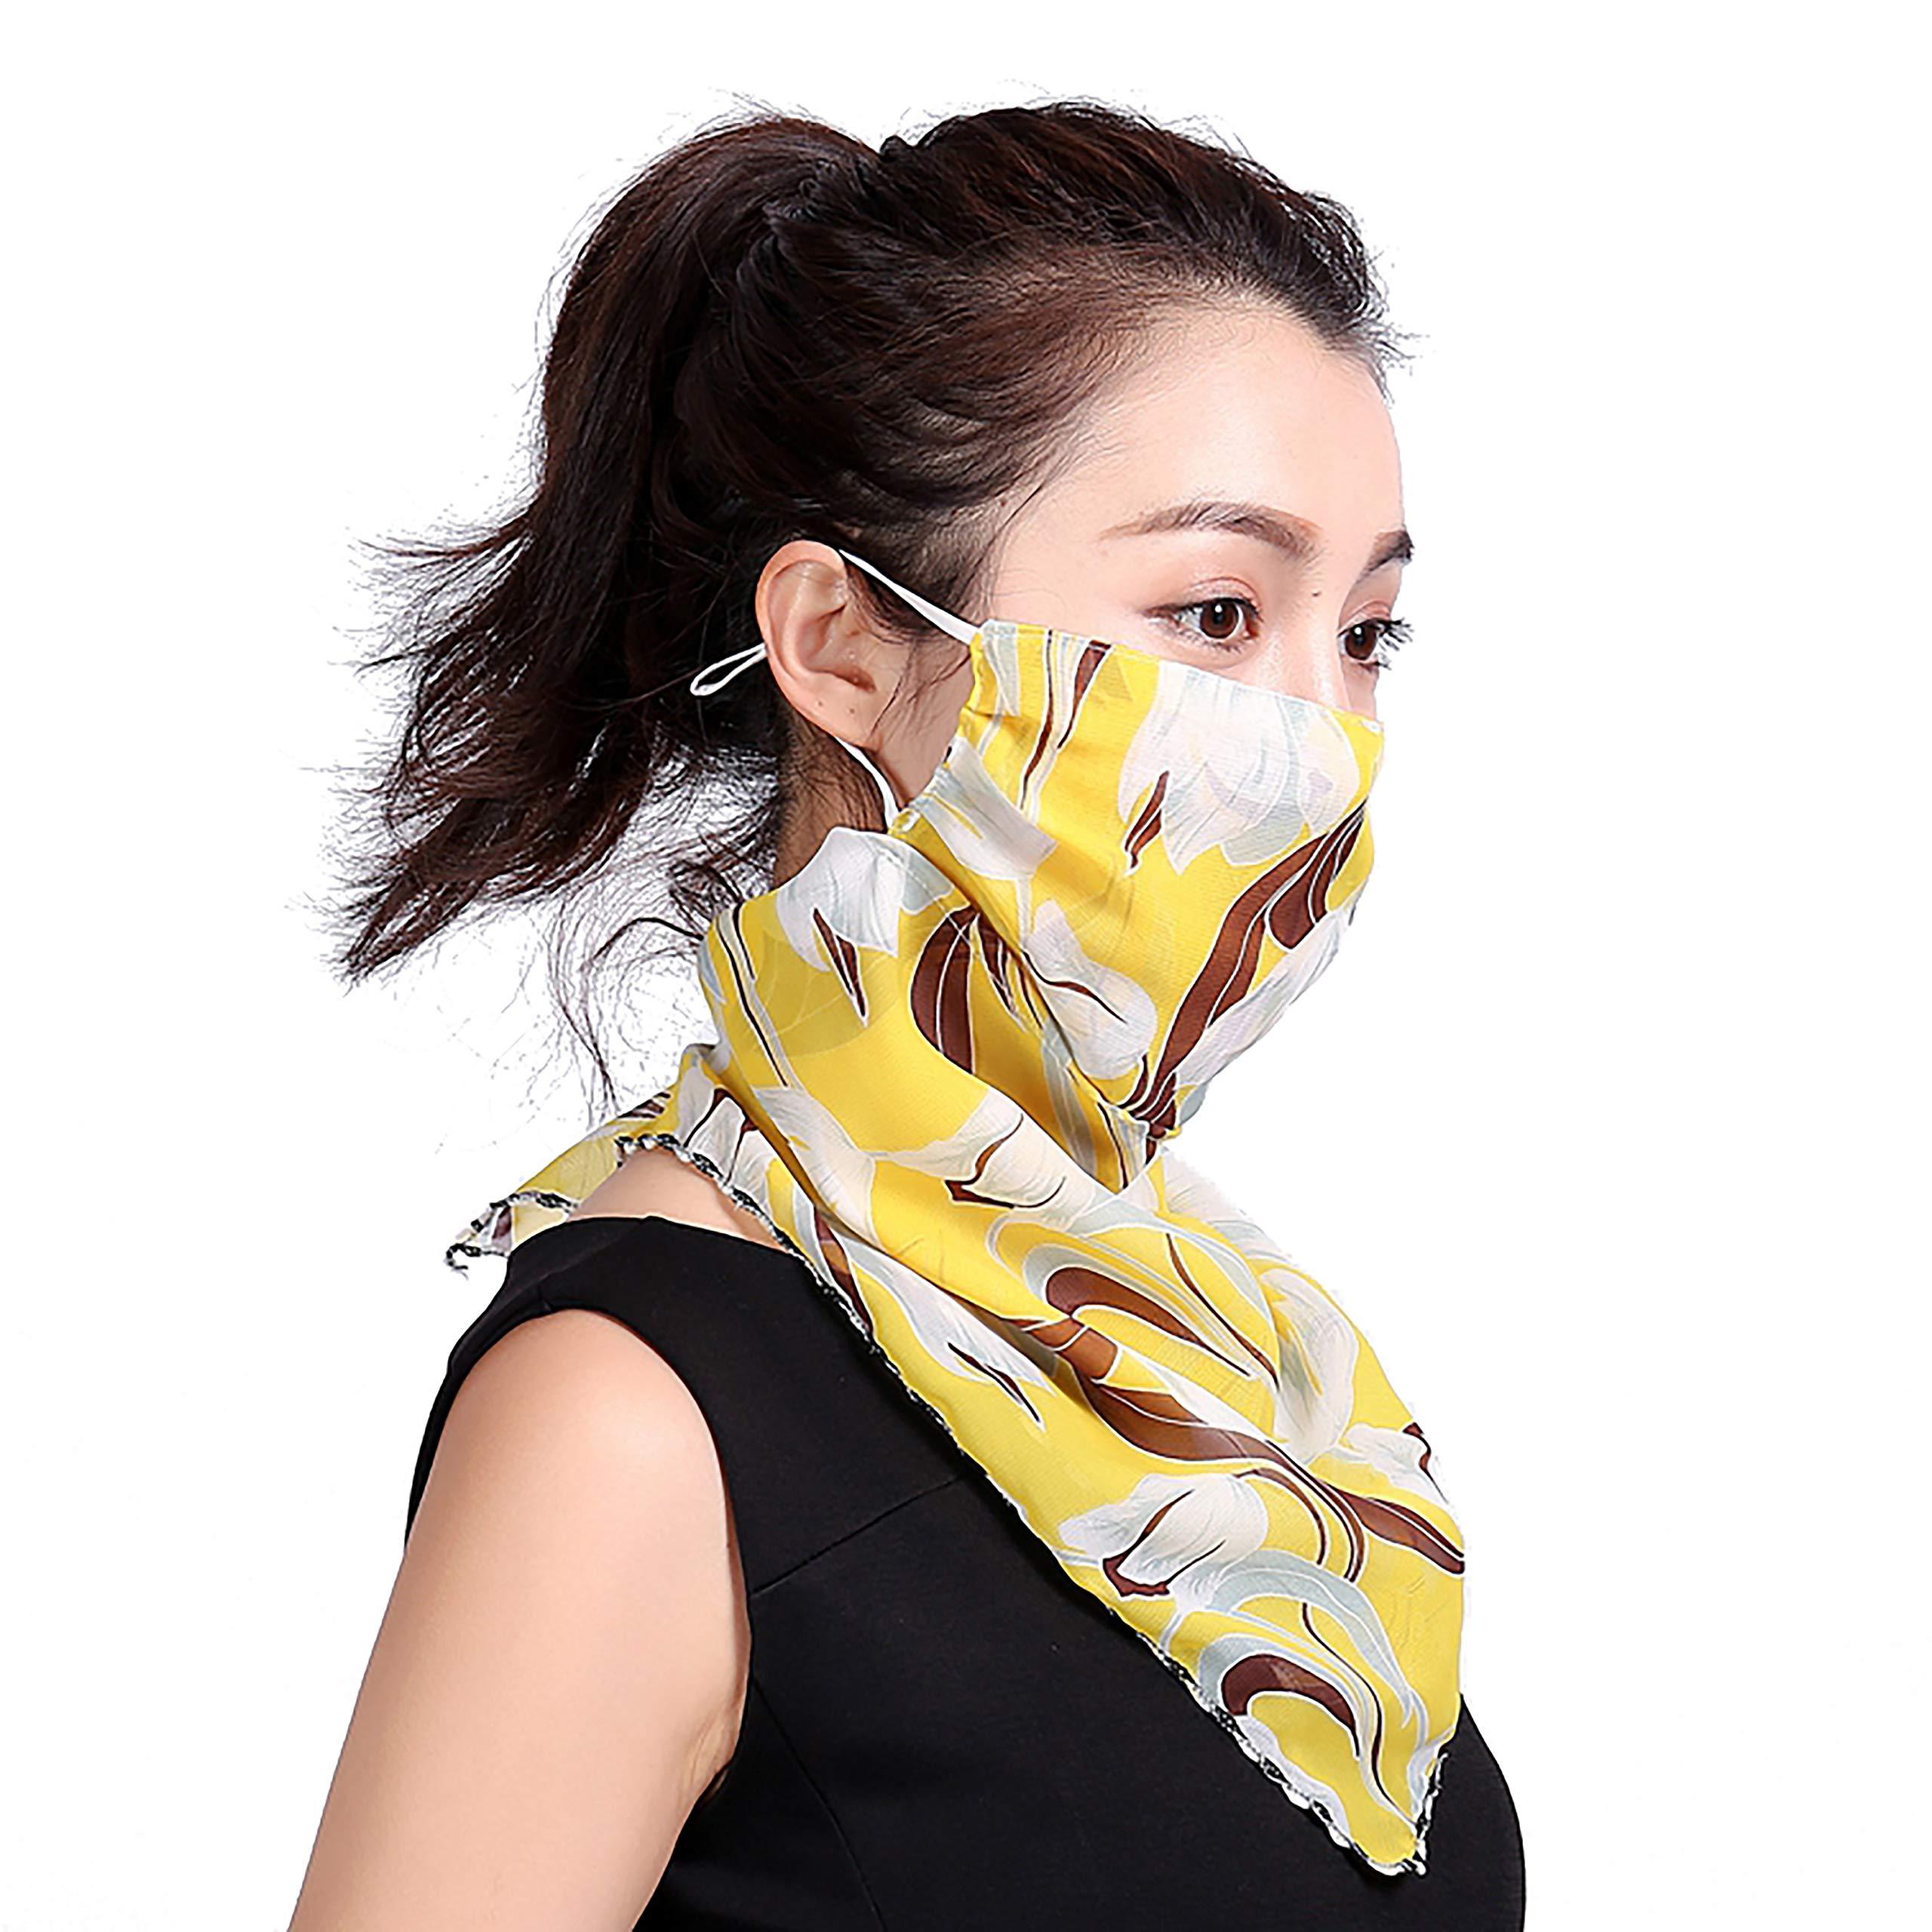 LXSLFY Chiffon scarf facial Mask-Women's Dustproof and Ultraviolet Turban-Balaclava-Adjustable Comfortable Breathable